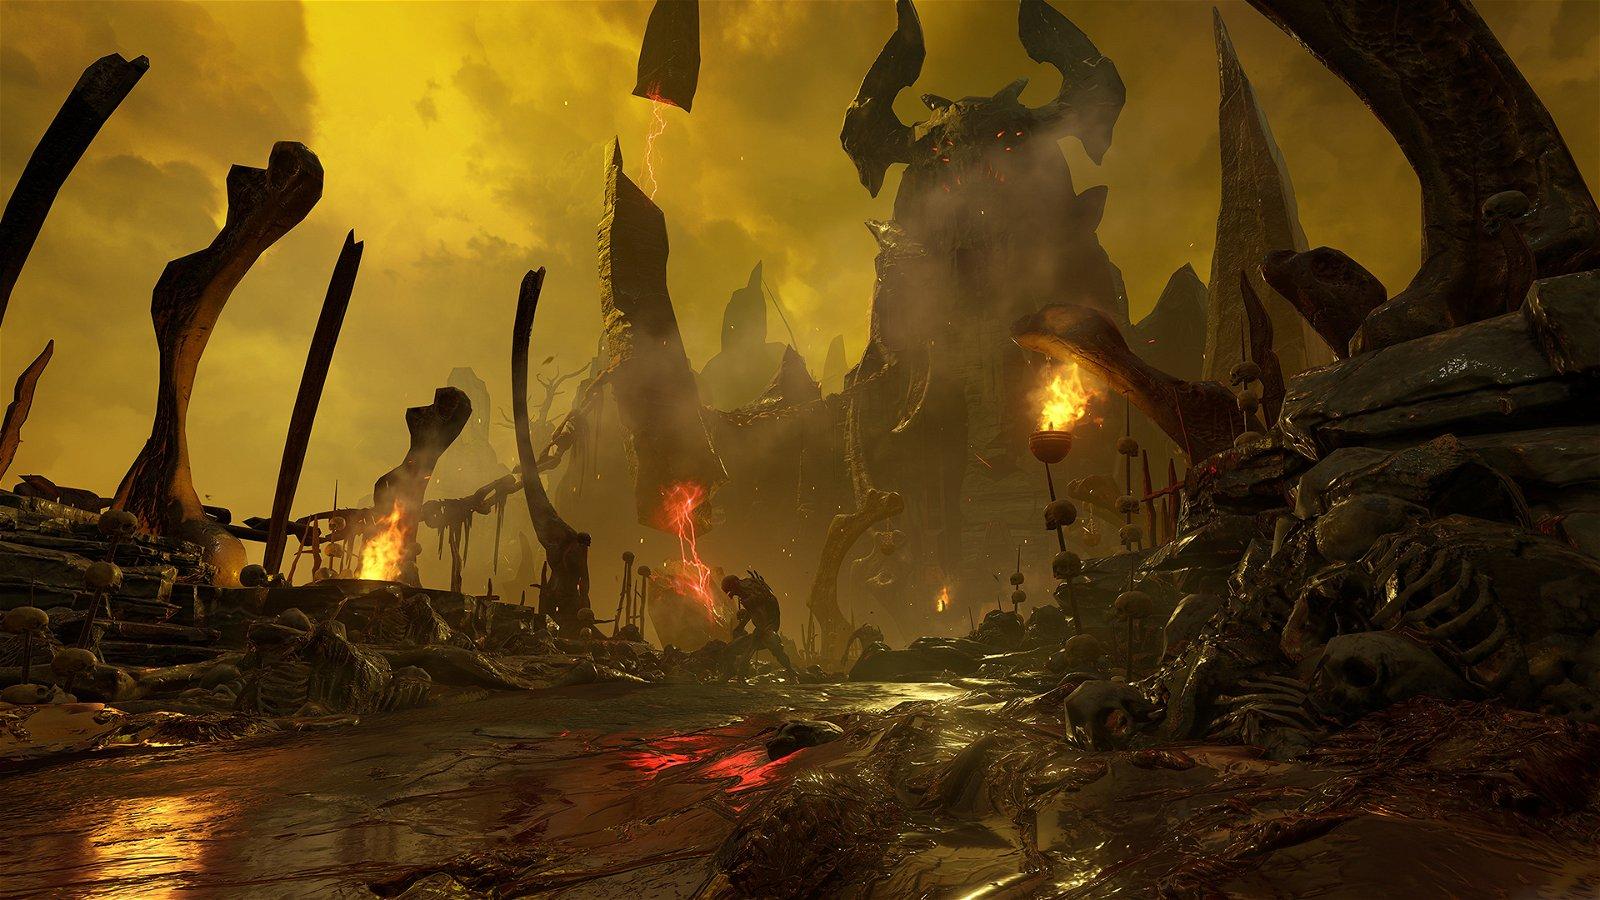 New Screenshots From Doom - 2015-07-24 12:44:16